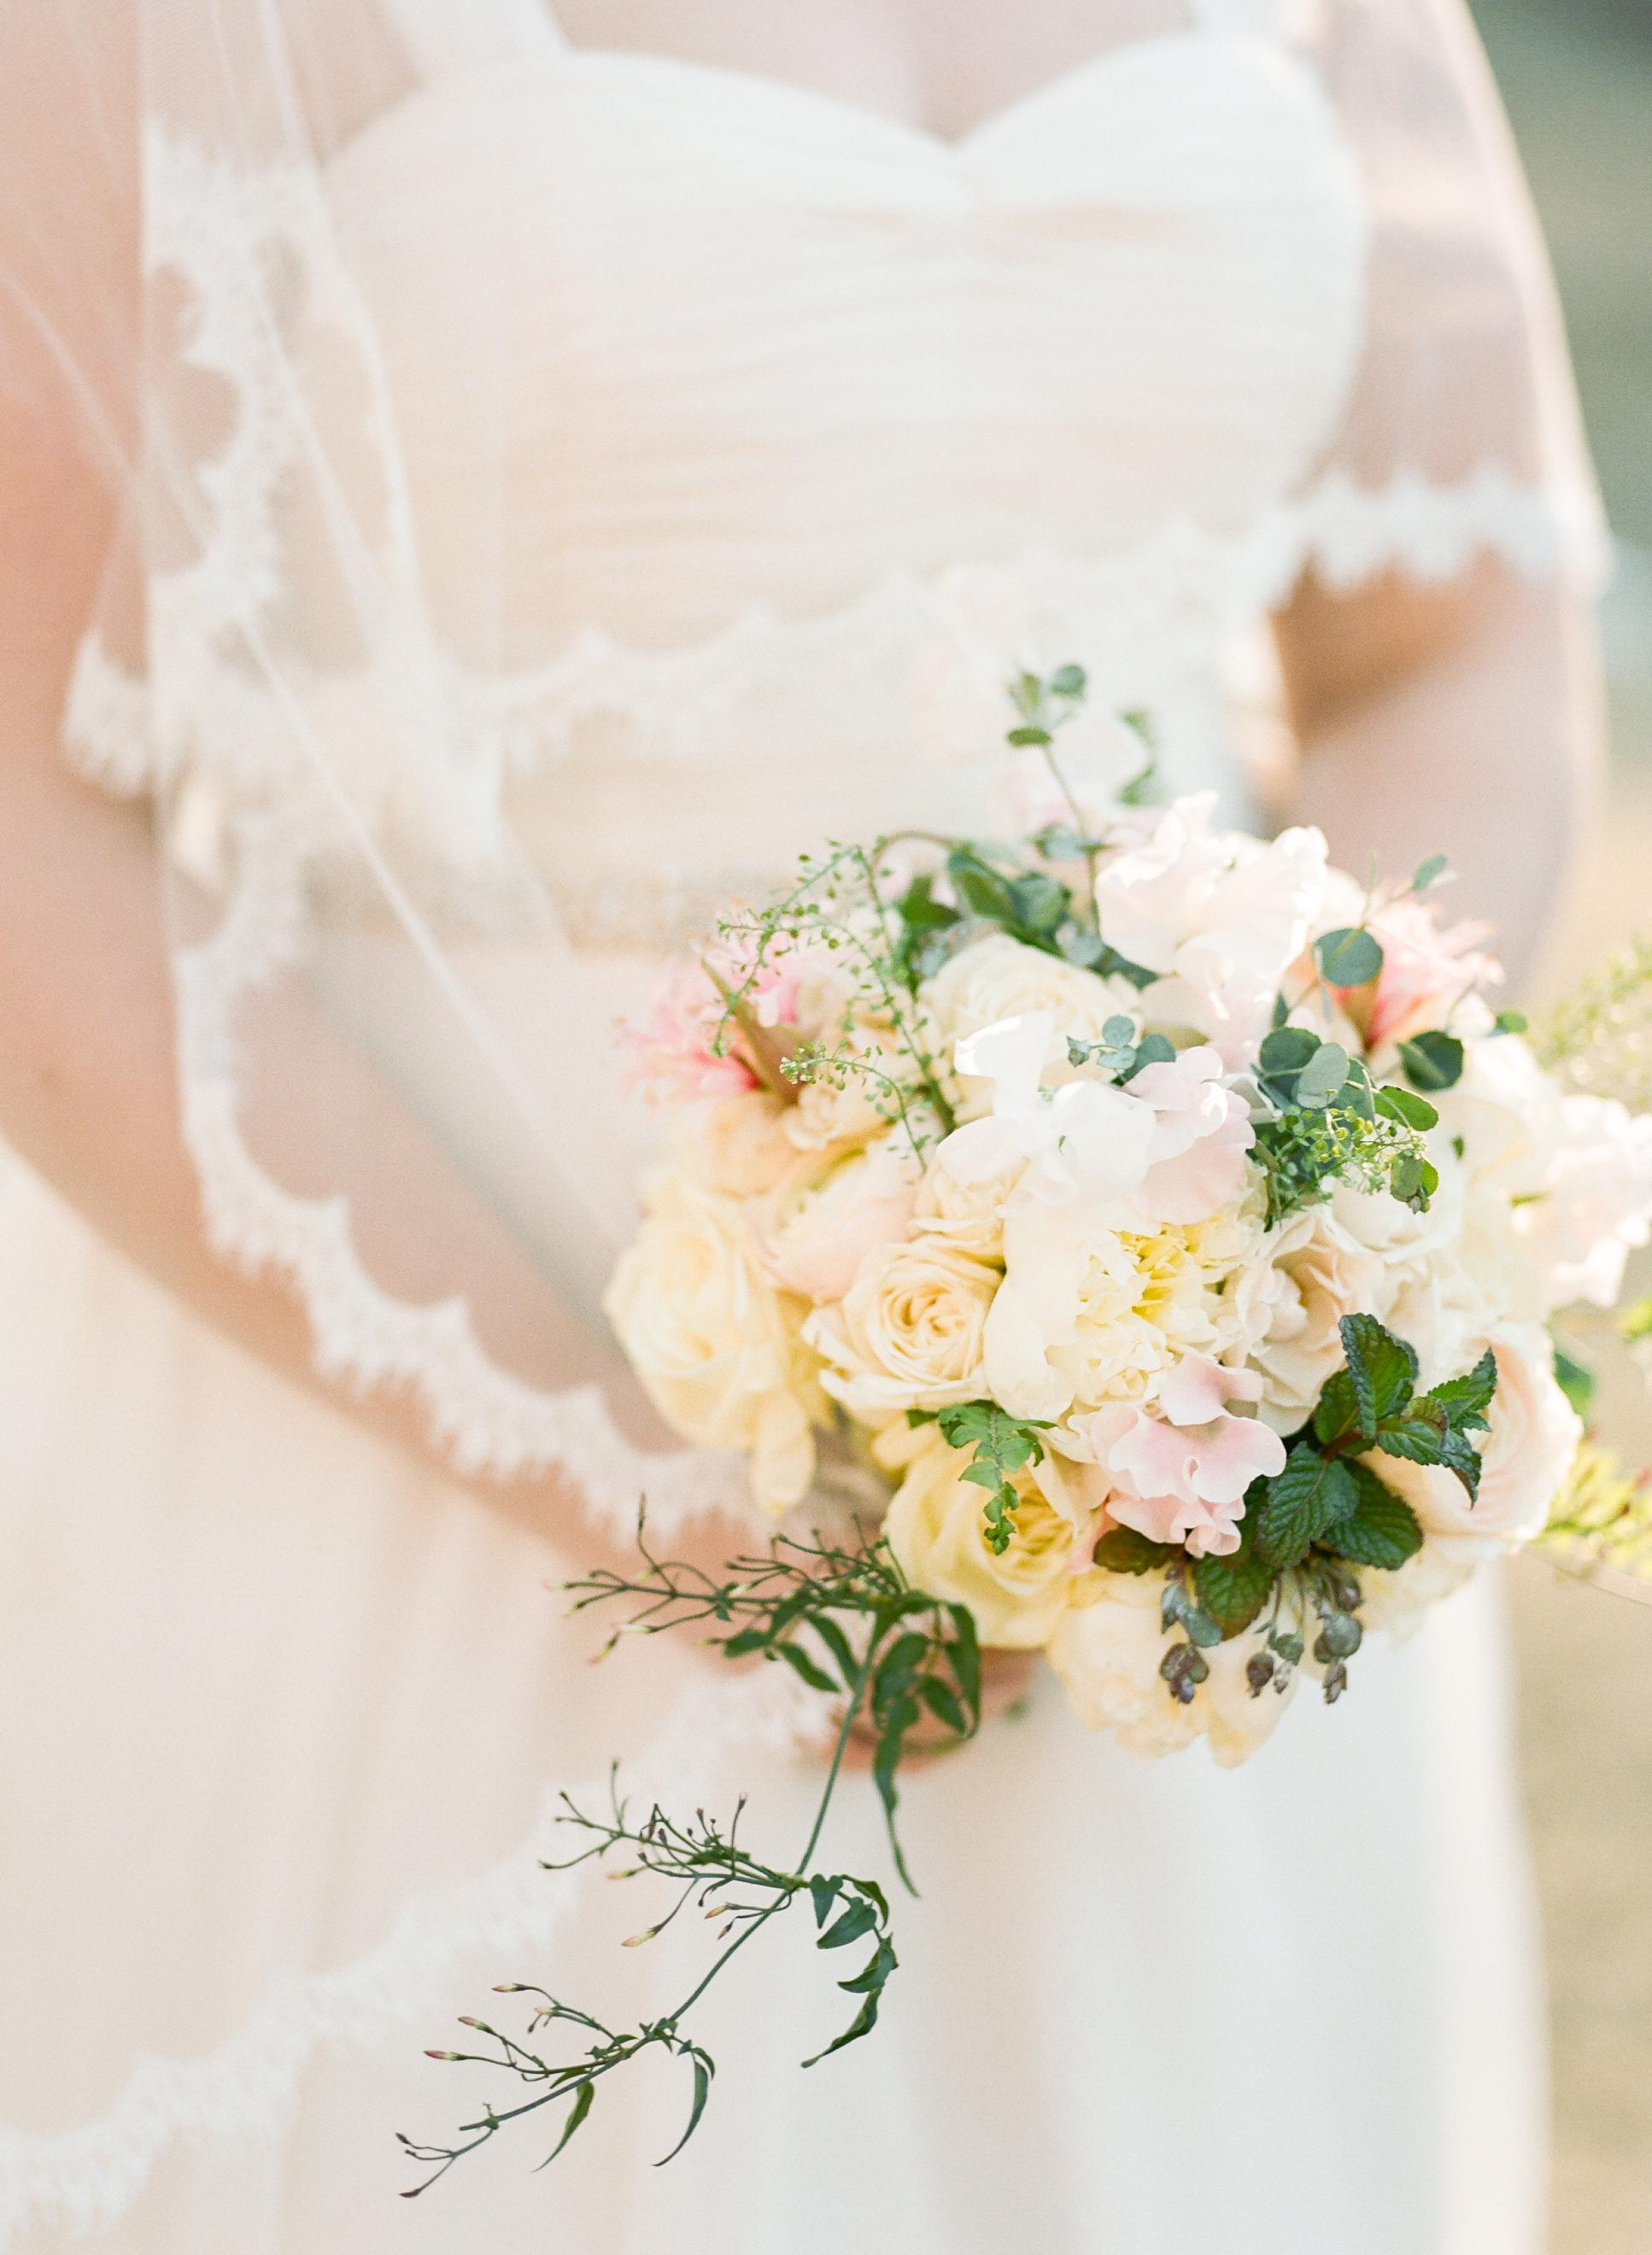 Twin_Owls_Steakhouse-wedding_photographer_Estes_Park_Lisa_ODwyer-769.jpg